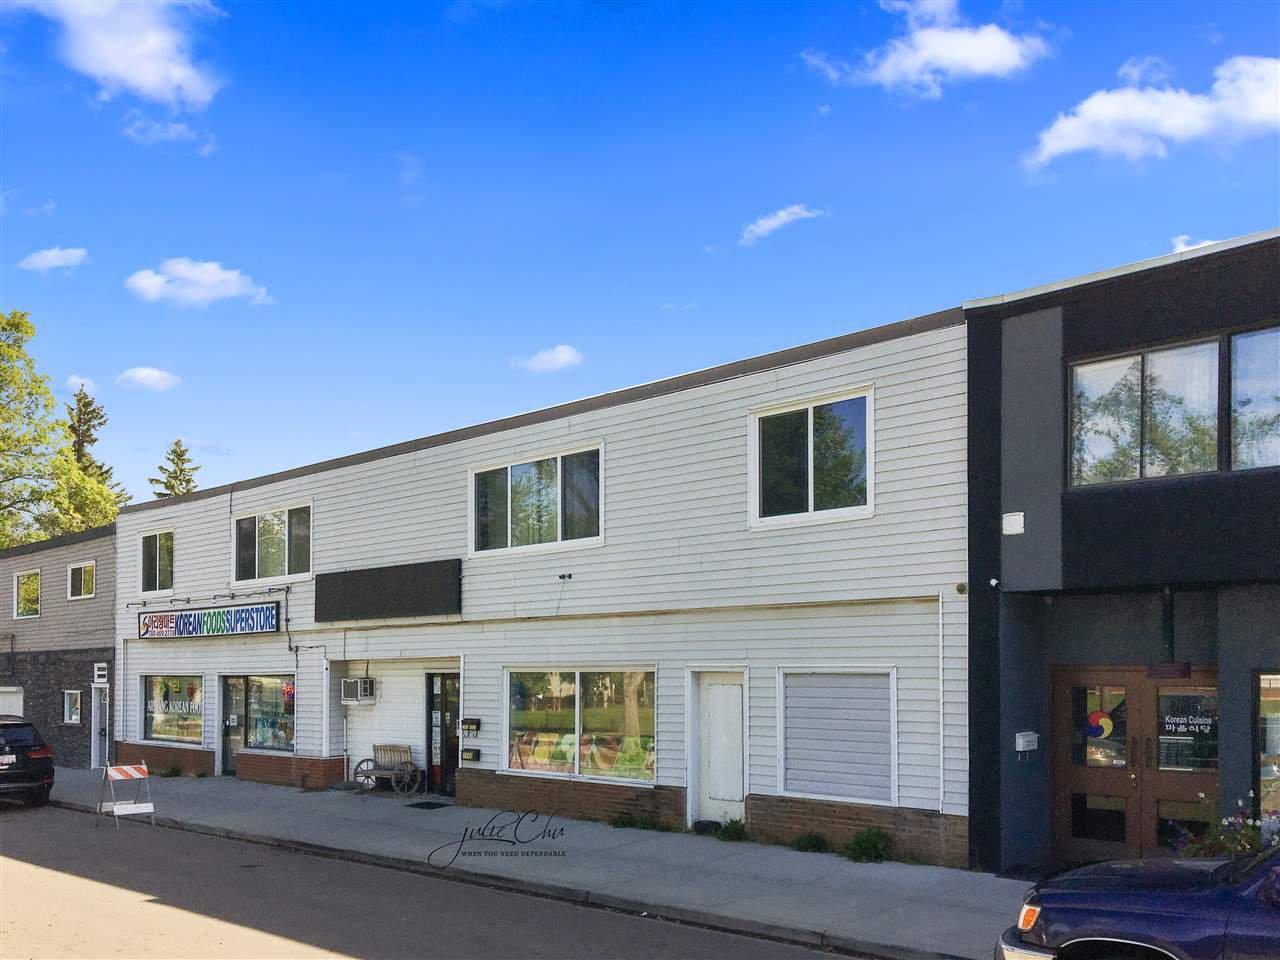 Main Photo: 7743 85 Street in Edmonton: Zone 17 Multi-Family Commercial for sale : MLS®# E4215912